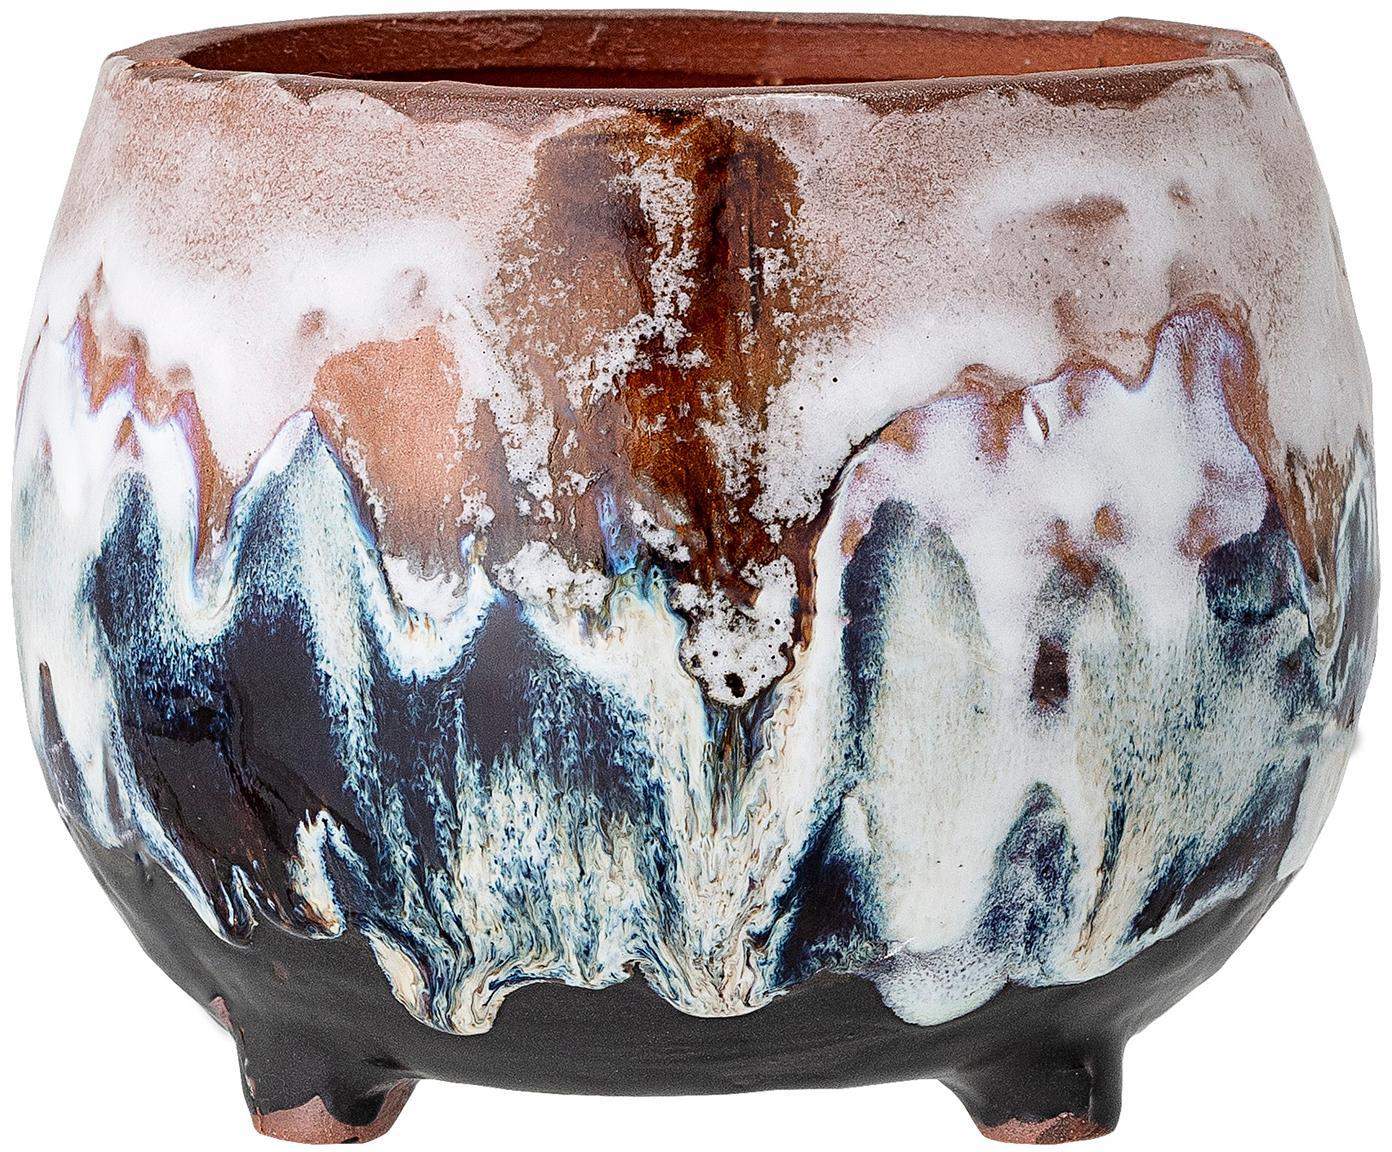 Handgefertigter Übertopf Sasa, Terracotta, Mehrfarbig, Ø 14 x H 11 cm